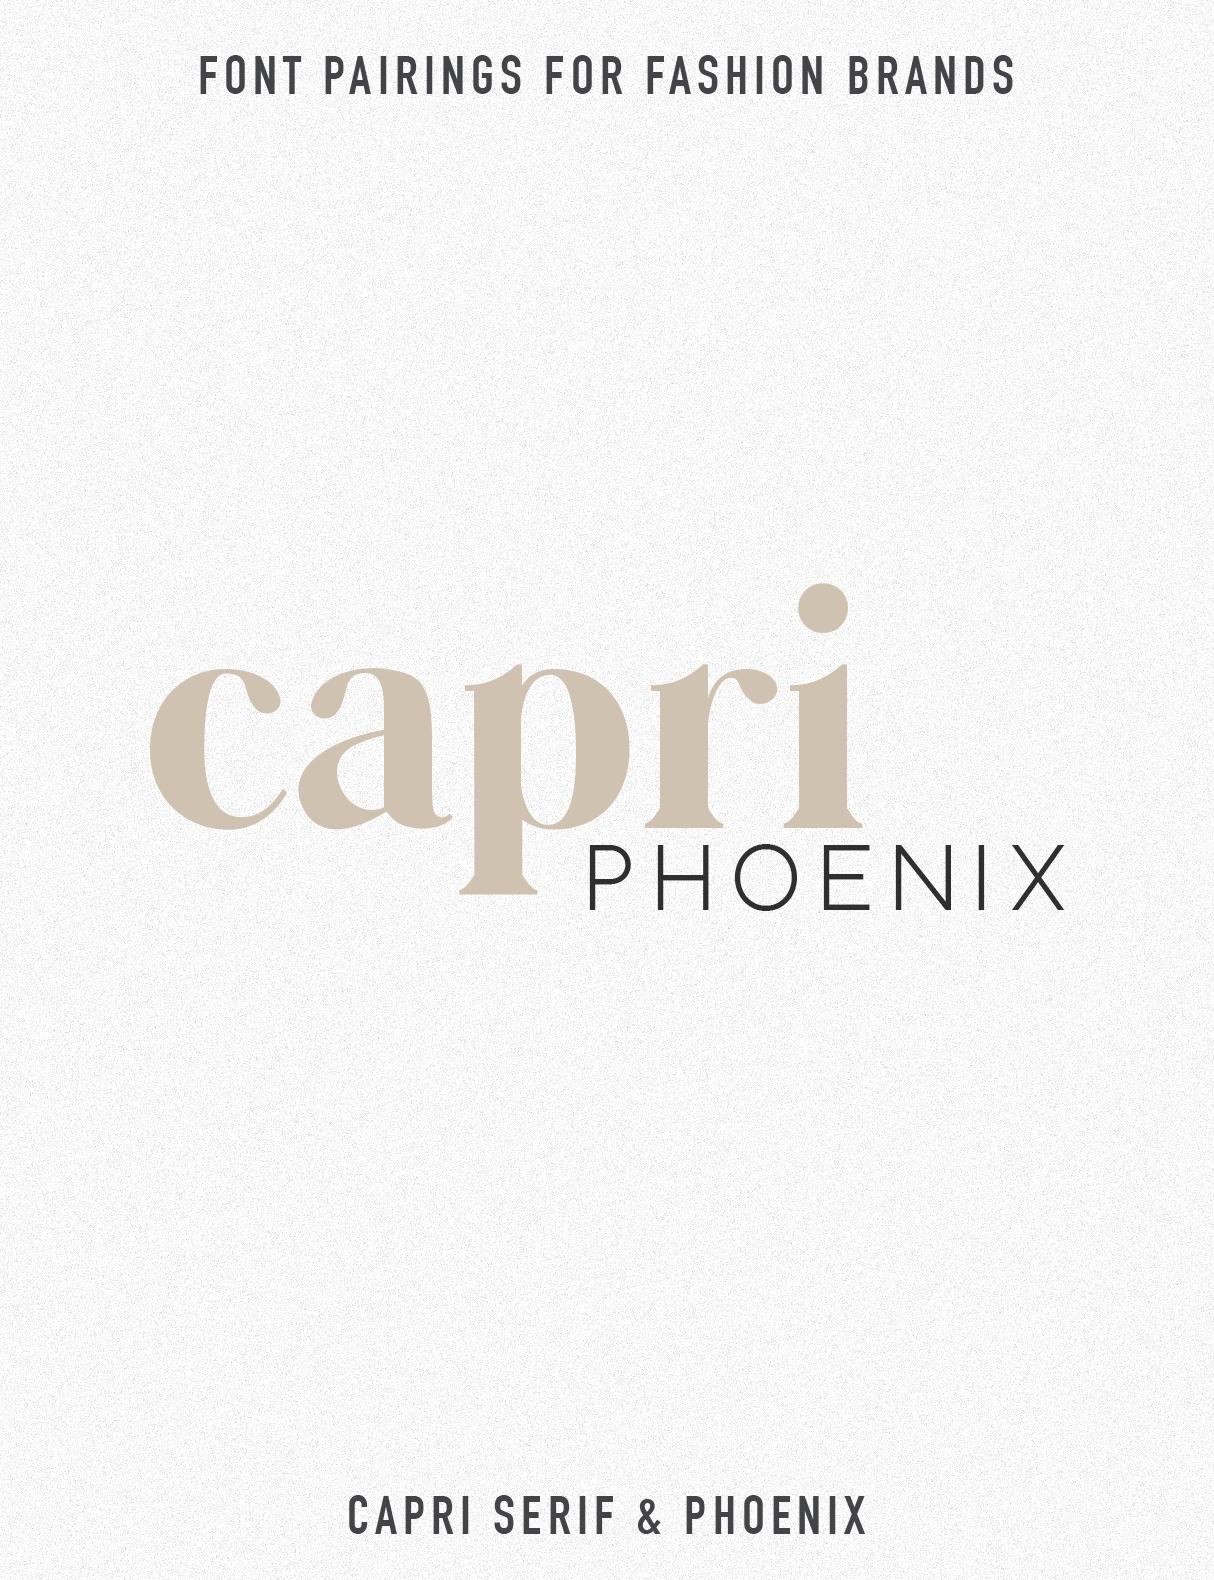 Jen Wagner Co Fashion Brand Font Pairings | Capri Phoenix.jpg